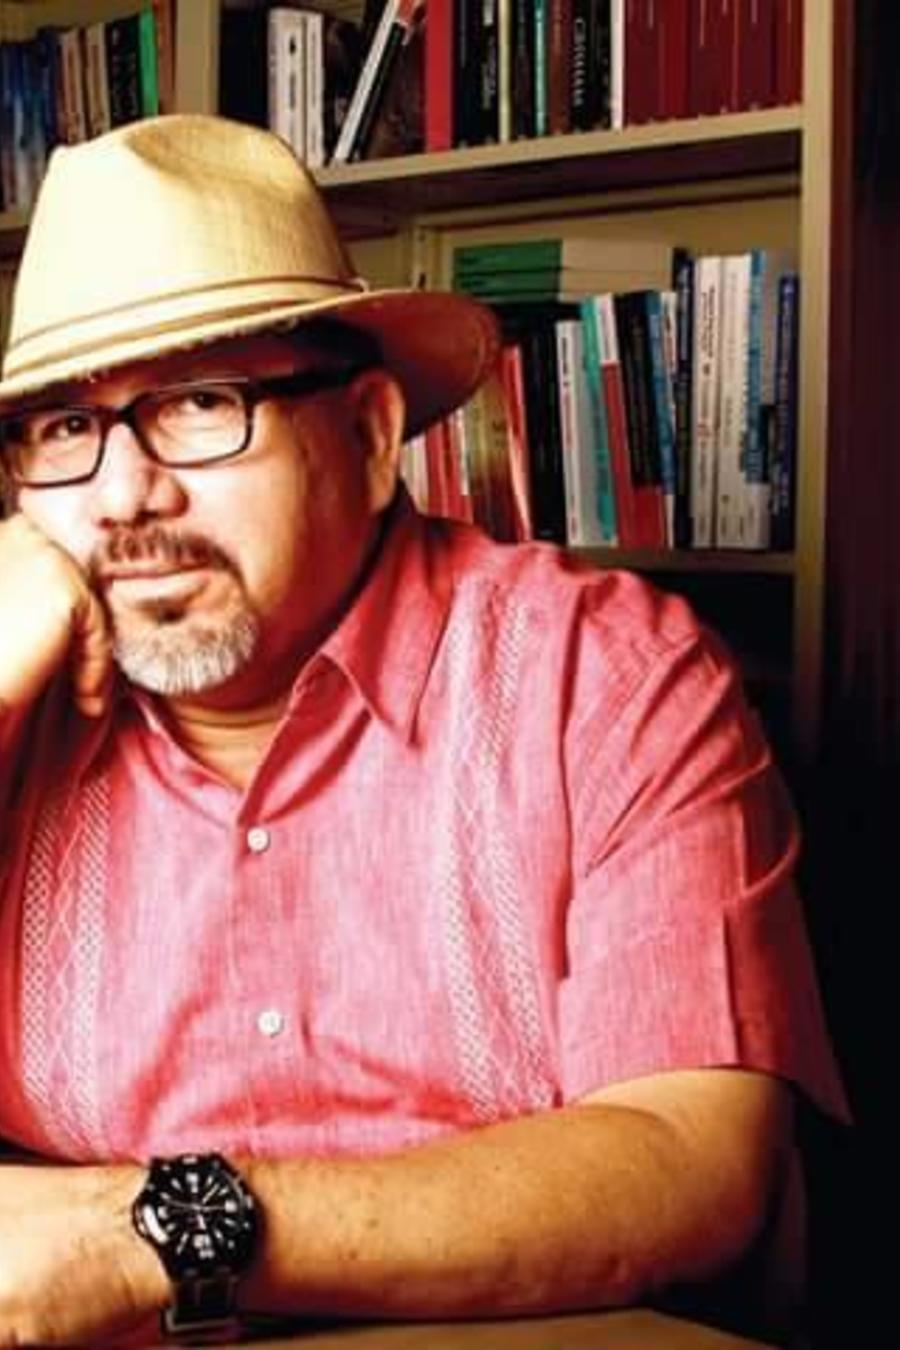 Javier Valdes Periodista